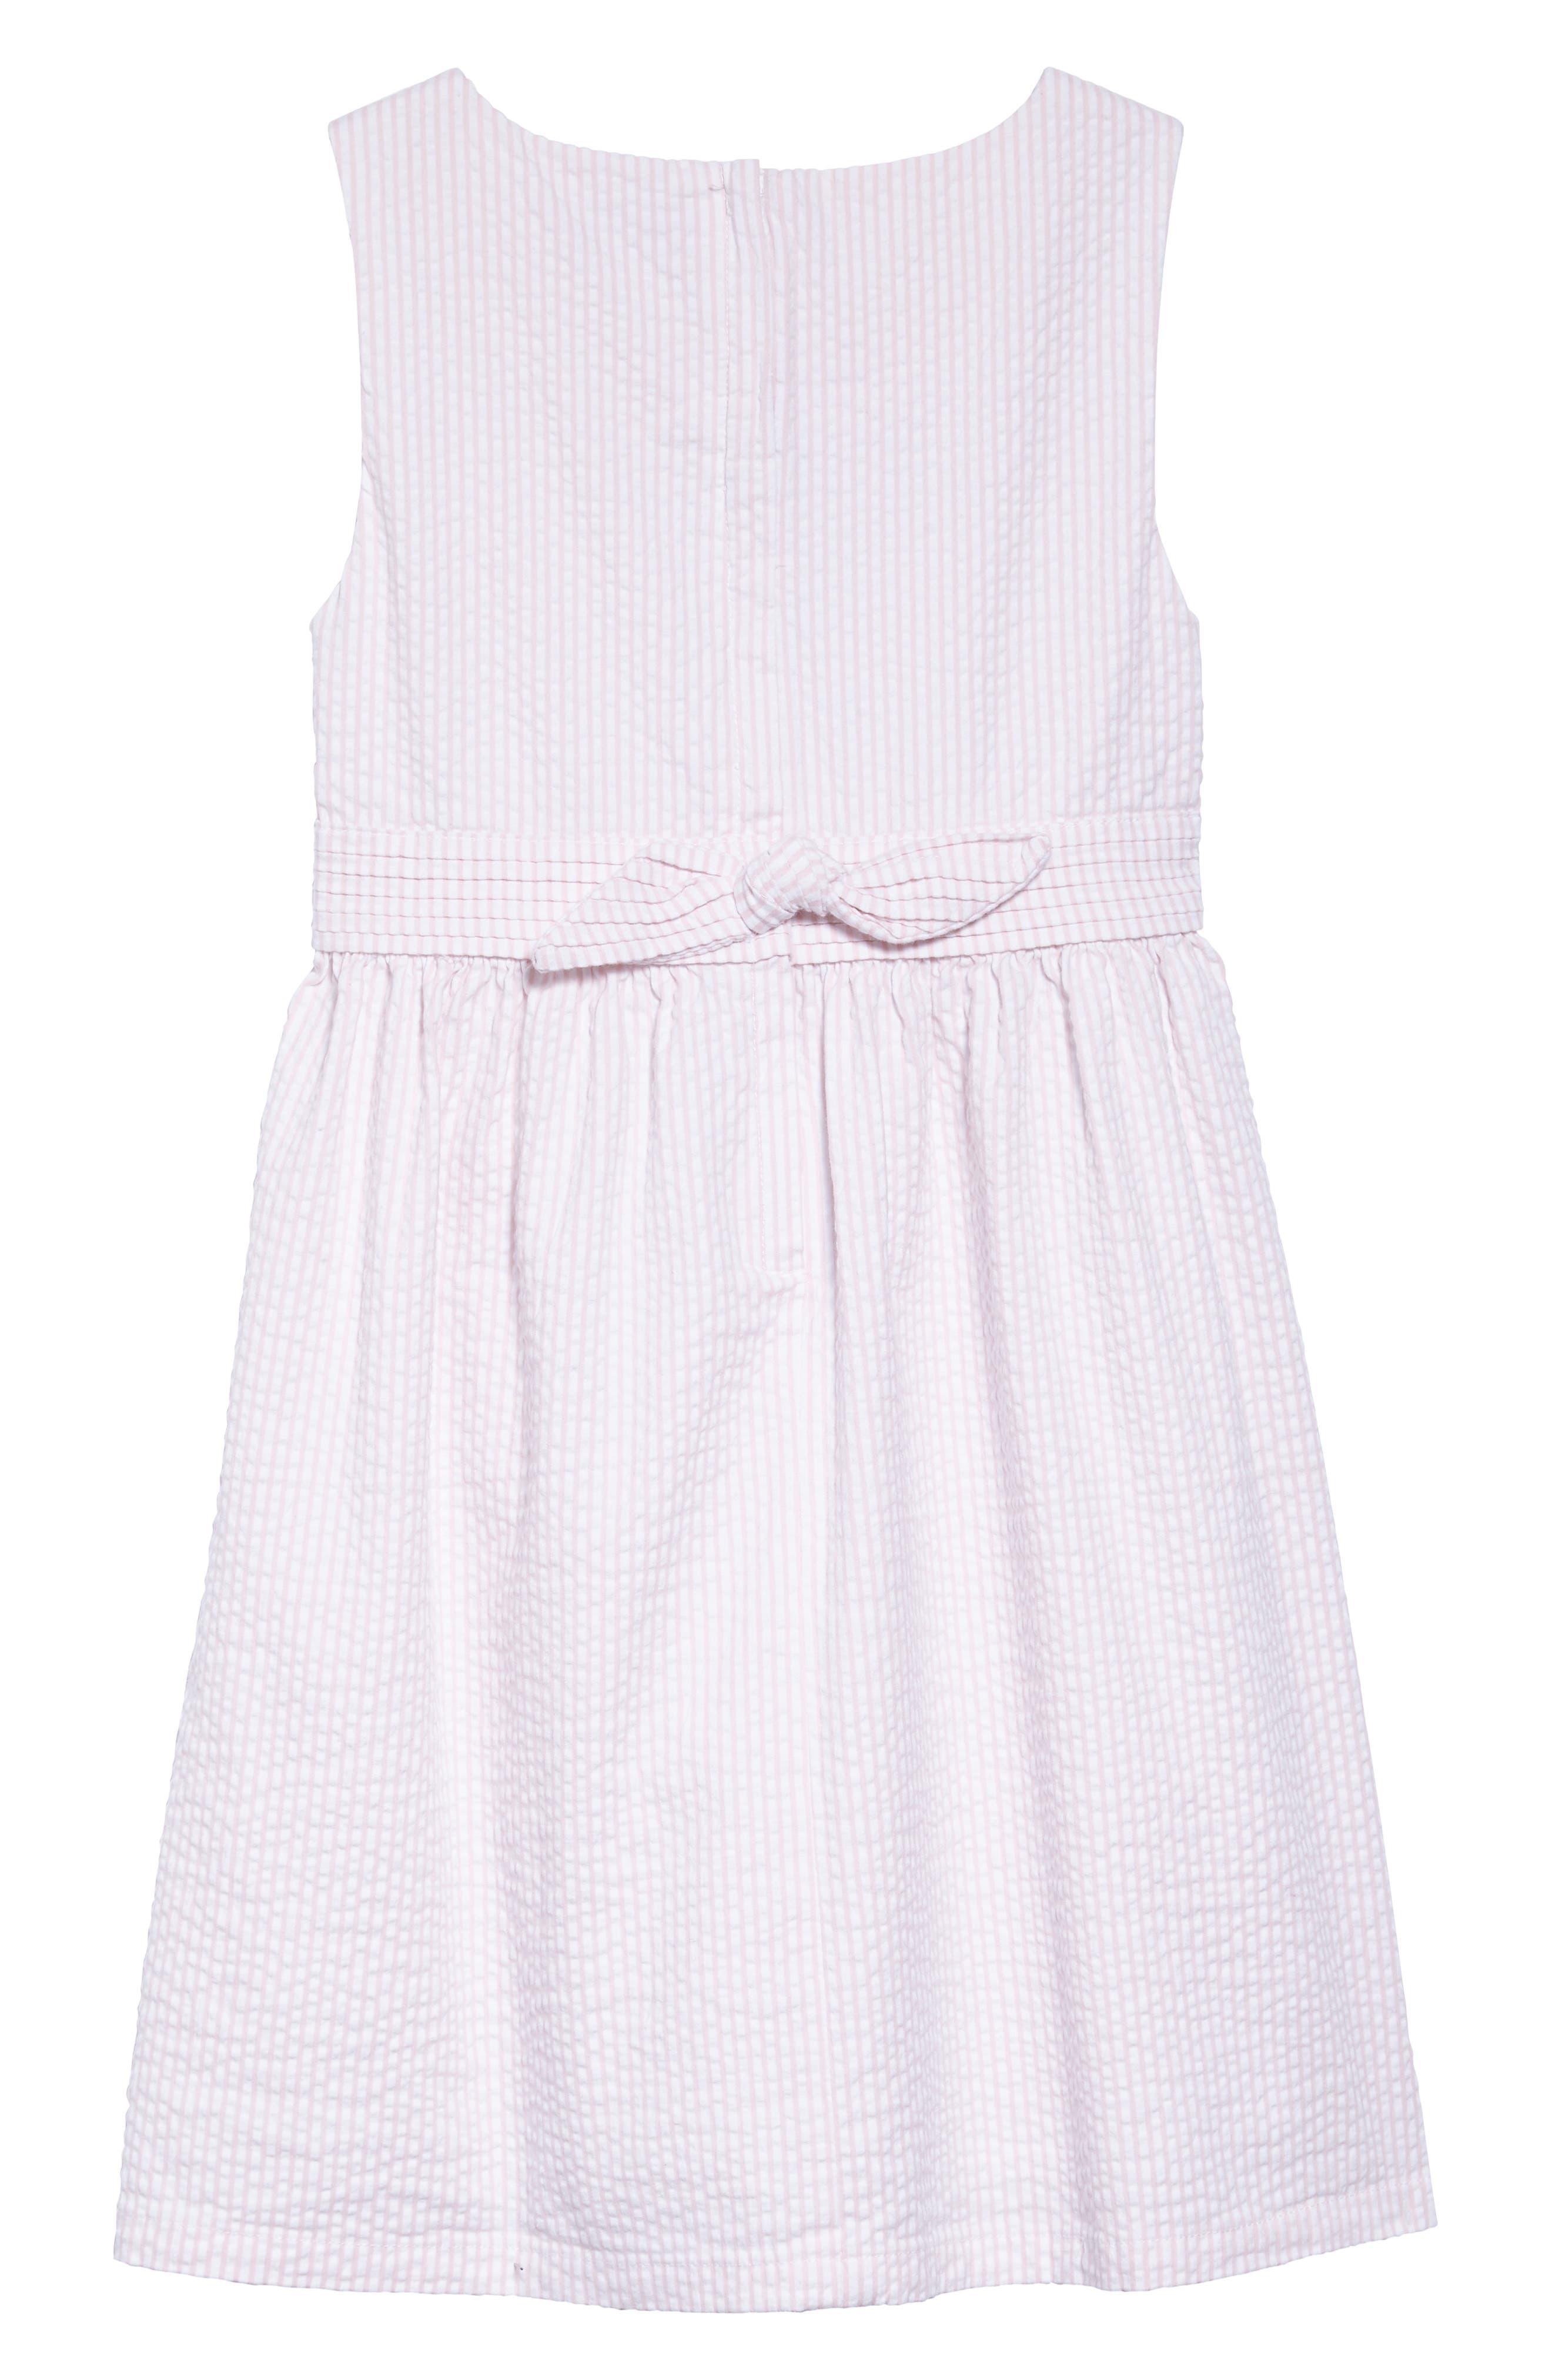 Seersucker Dress,                             Alternate thumbnail 2, color,                             Flamingo